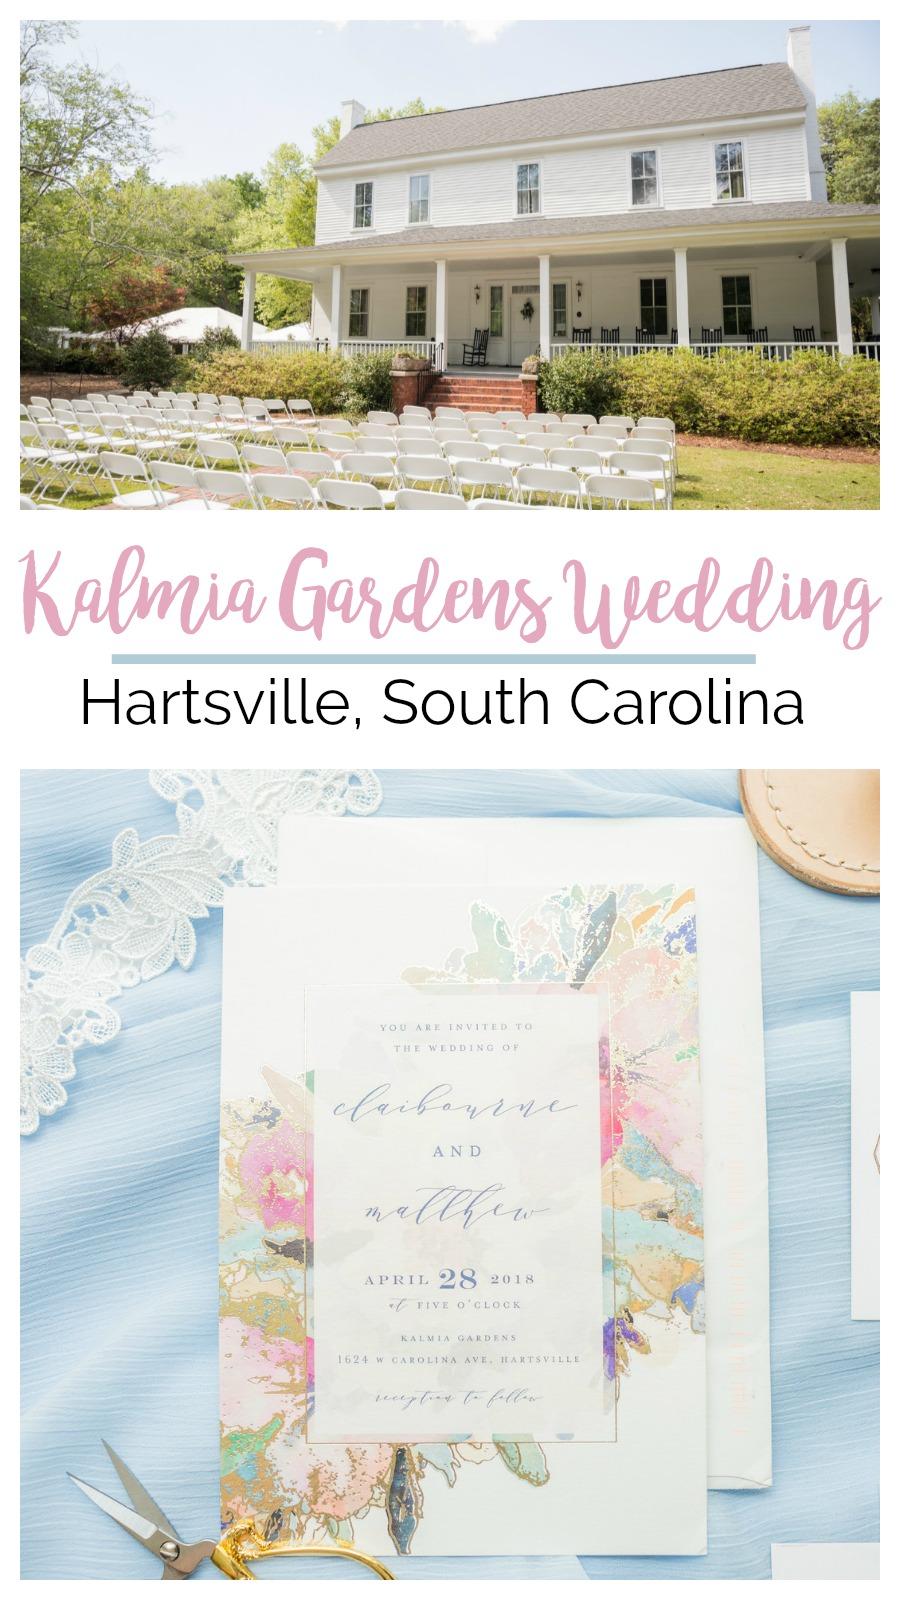 Claibourne + Matt: Poignant Kalmia Gardens Wedding, Hartsville, South Carolina   Palmetto State Weddings   Jessica Hart Photography   outdoor garden wedding   baby blue wedding inspiration